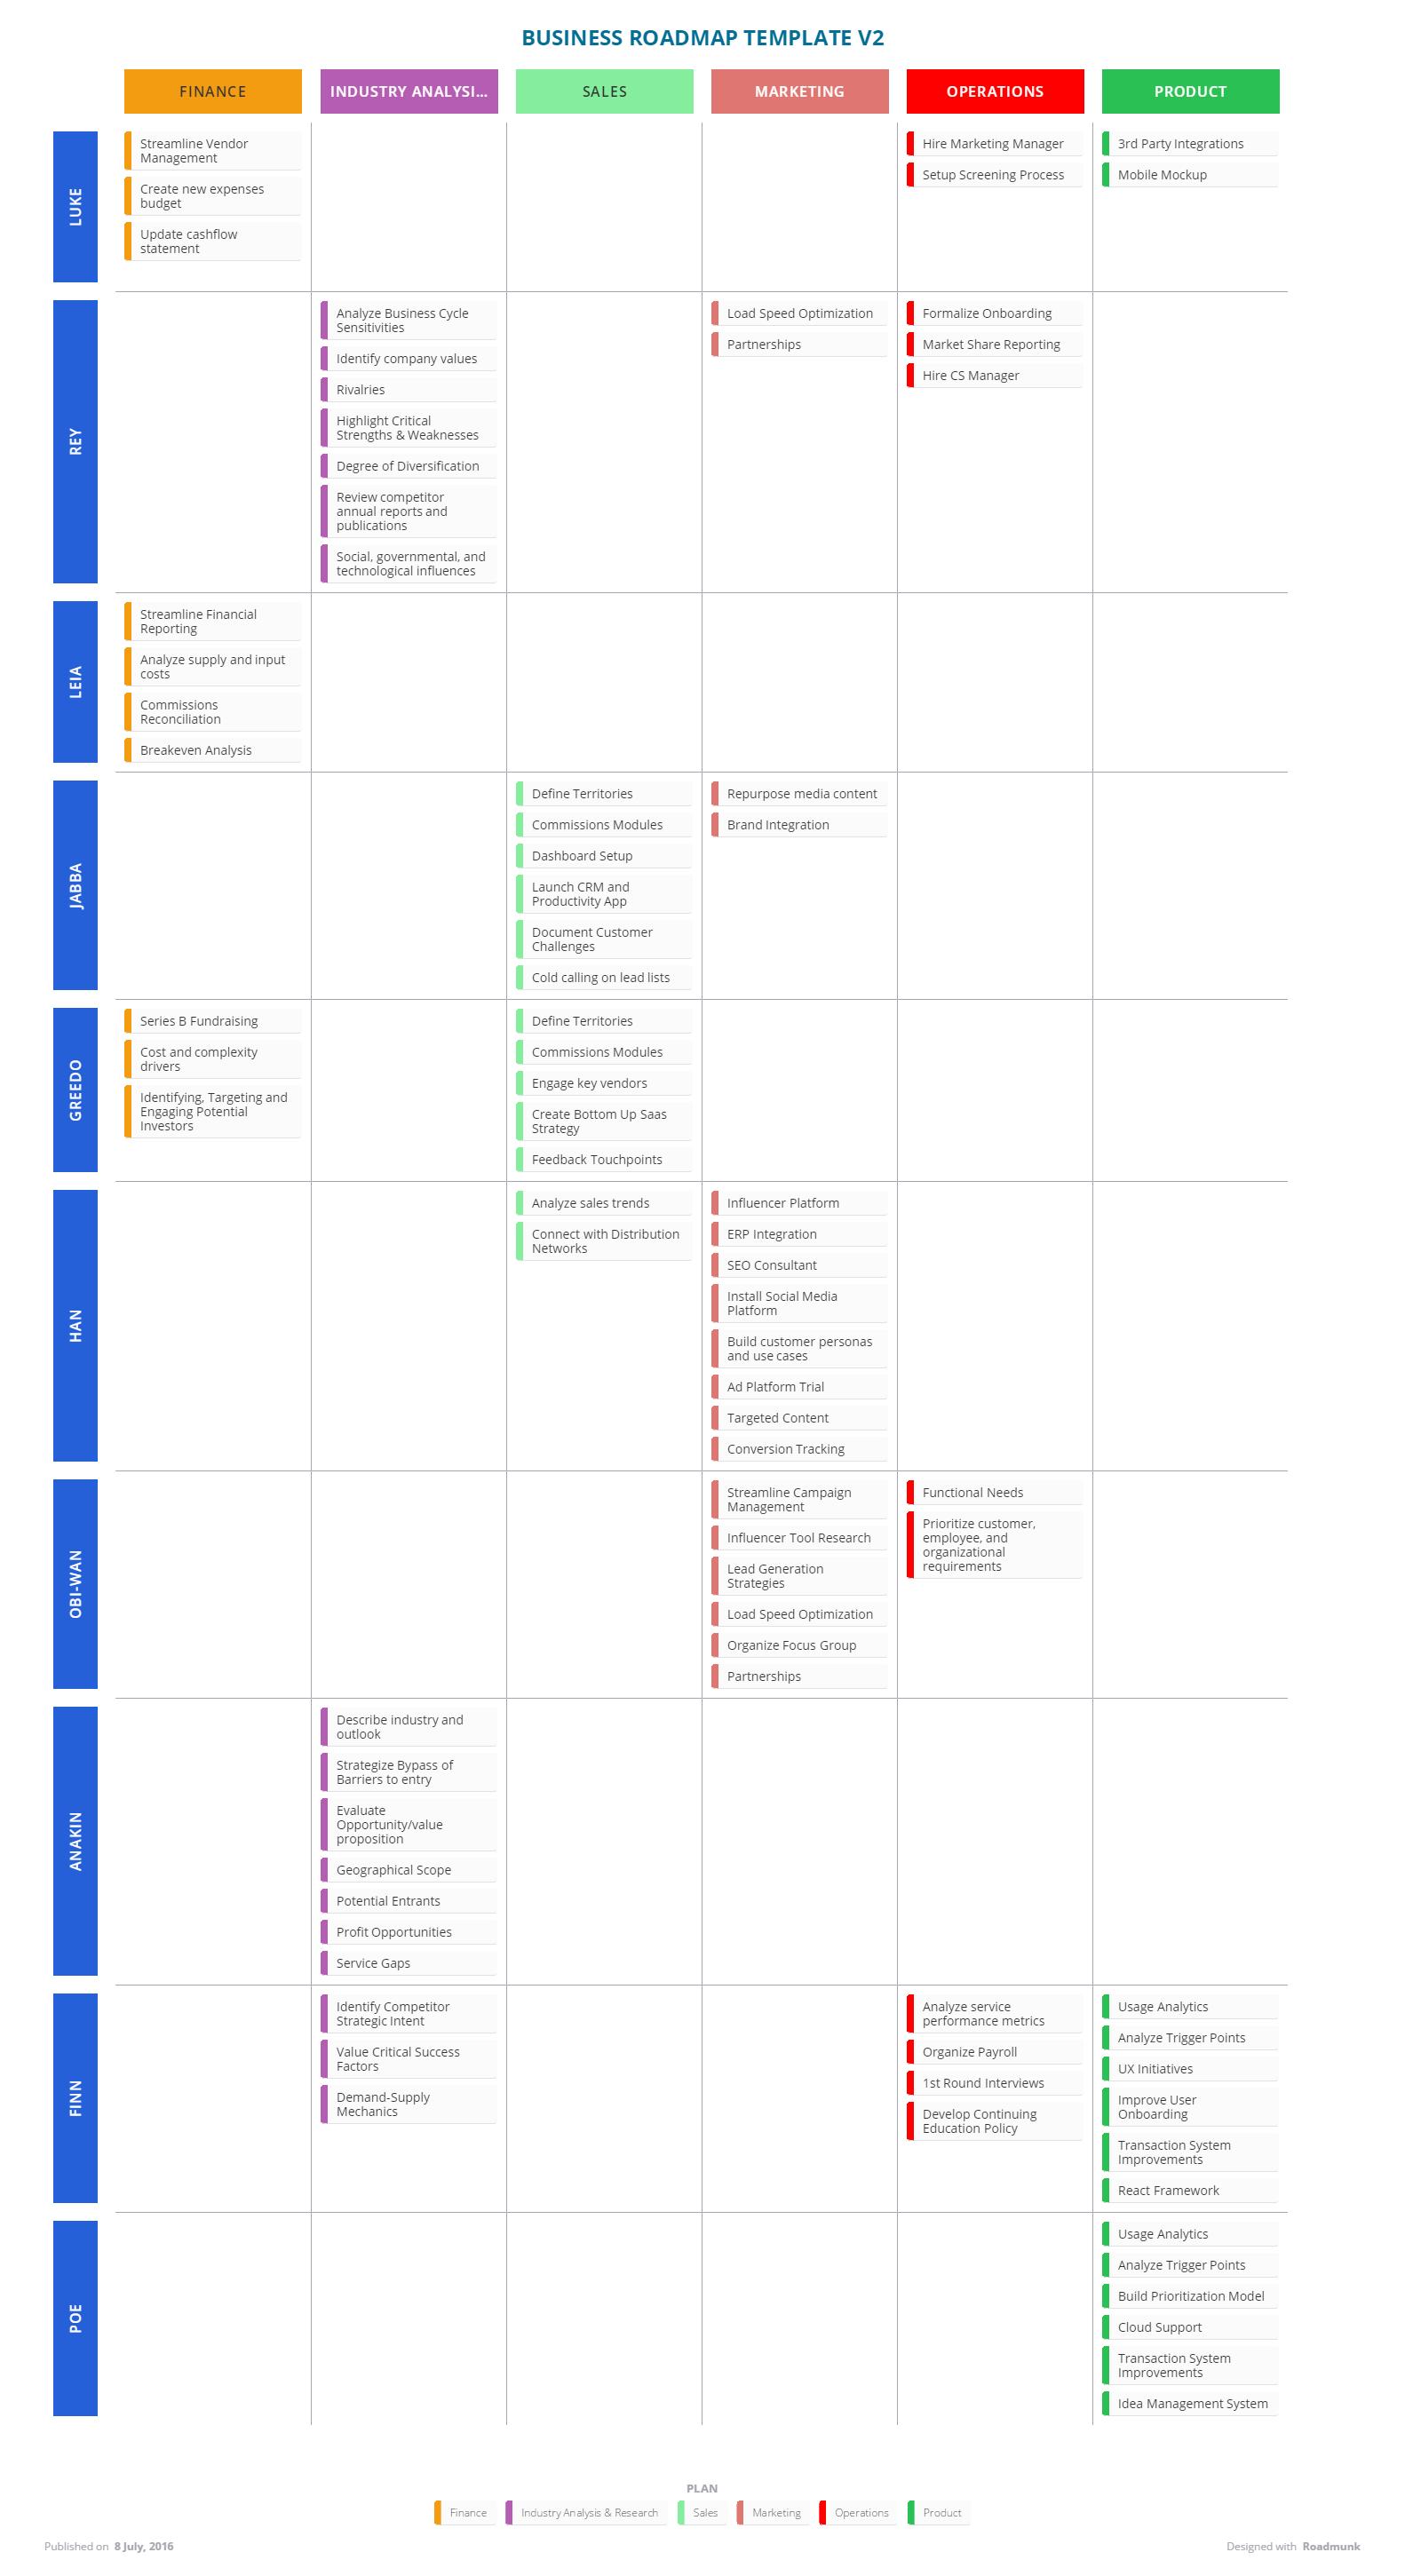 Business Roadmap Template – Business Roadmap Template